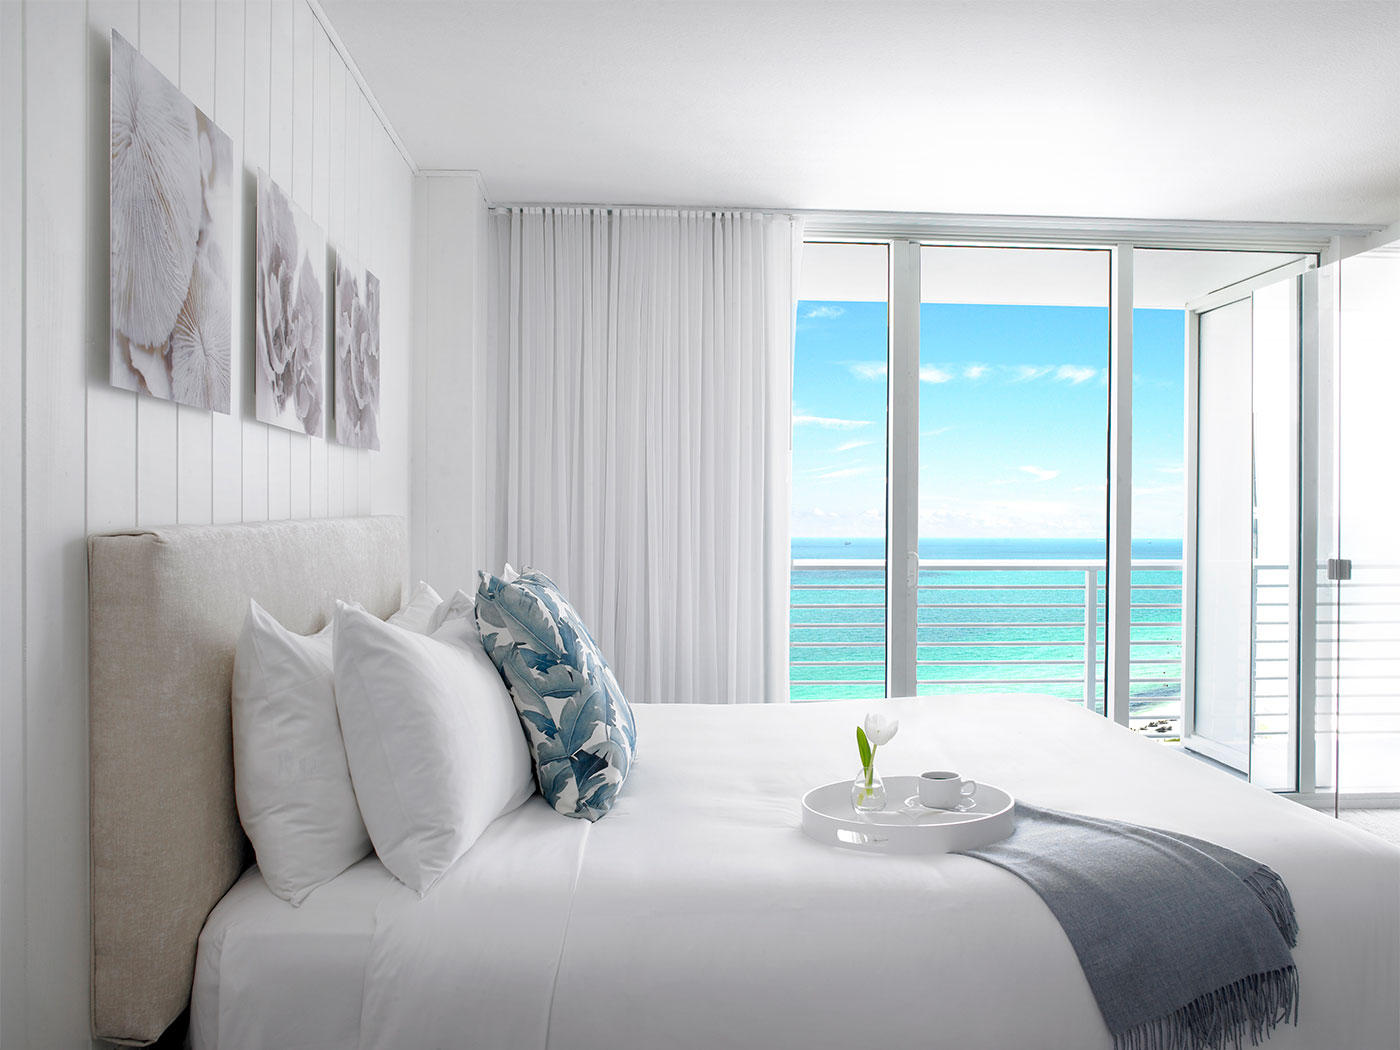 Grand Beach Hotel Miami Beach image 2